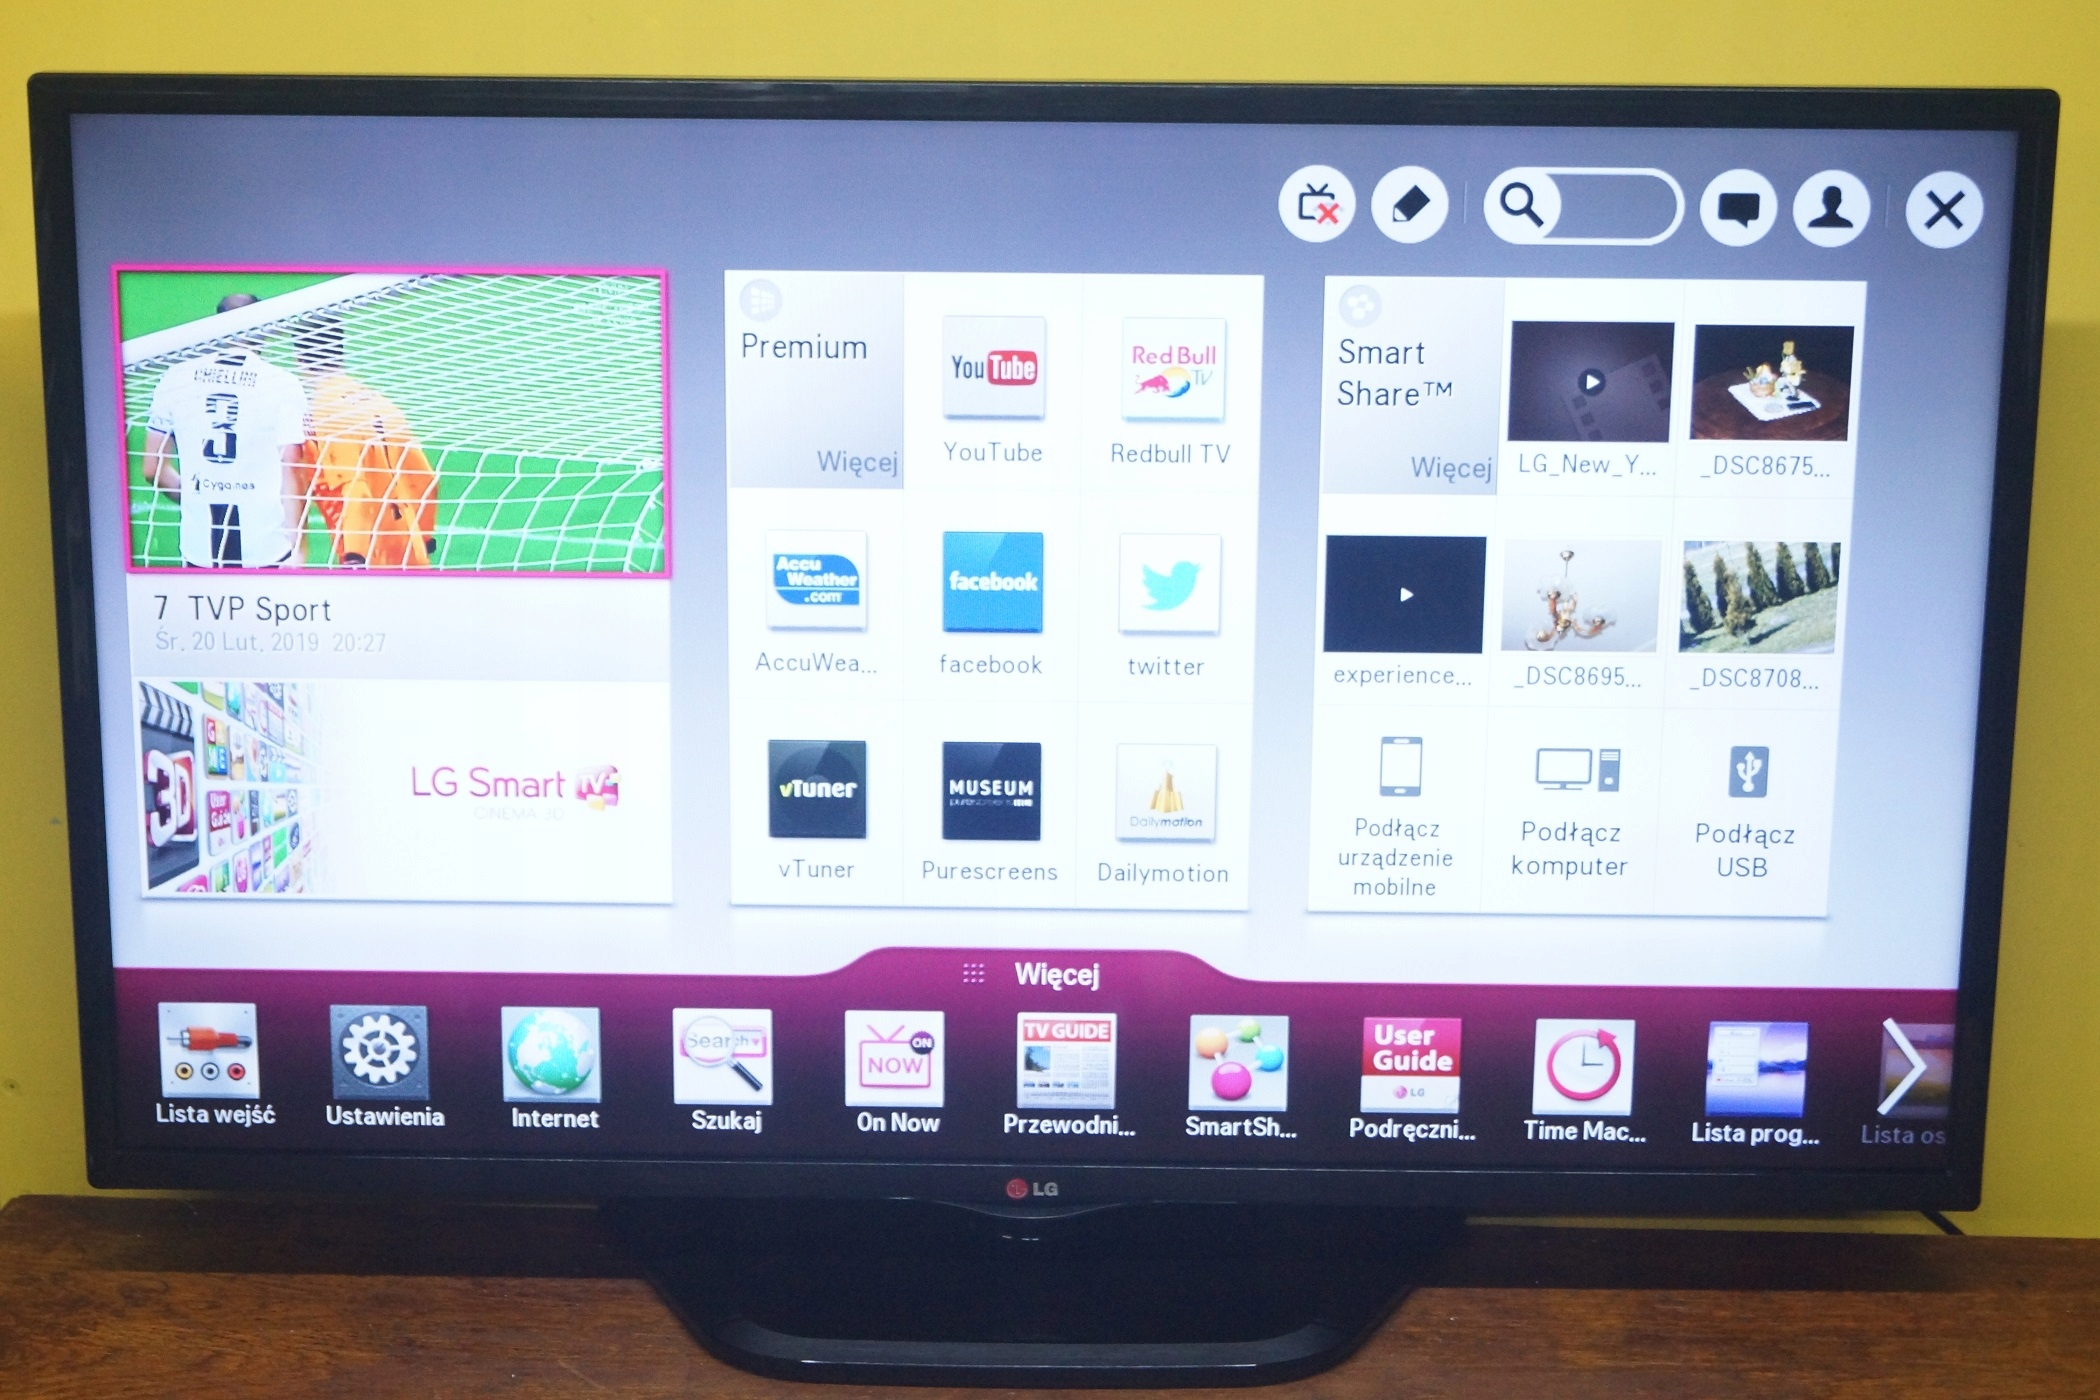 Nieuw LG 42LN5708 SMART TV DVB-T 42 CALE SUPER OKAZJA - 7861087291 NR-17